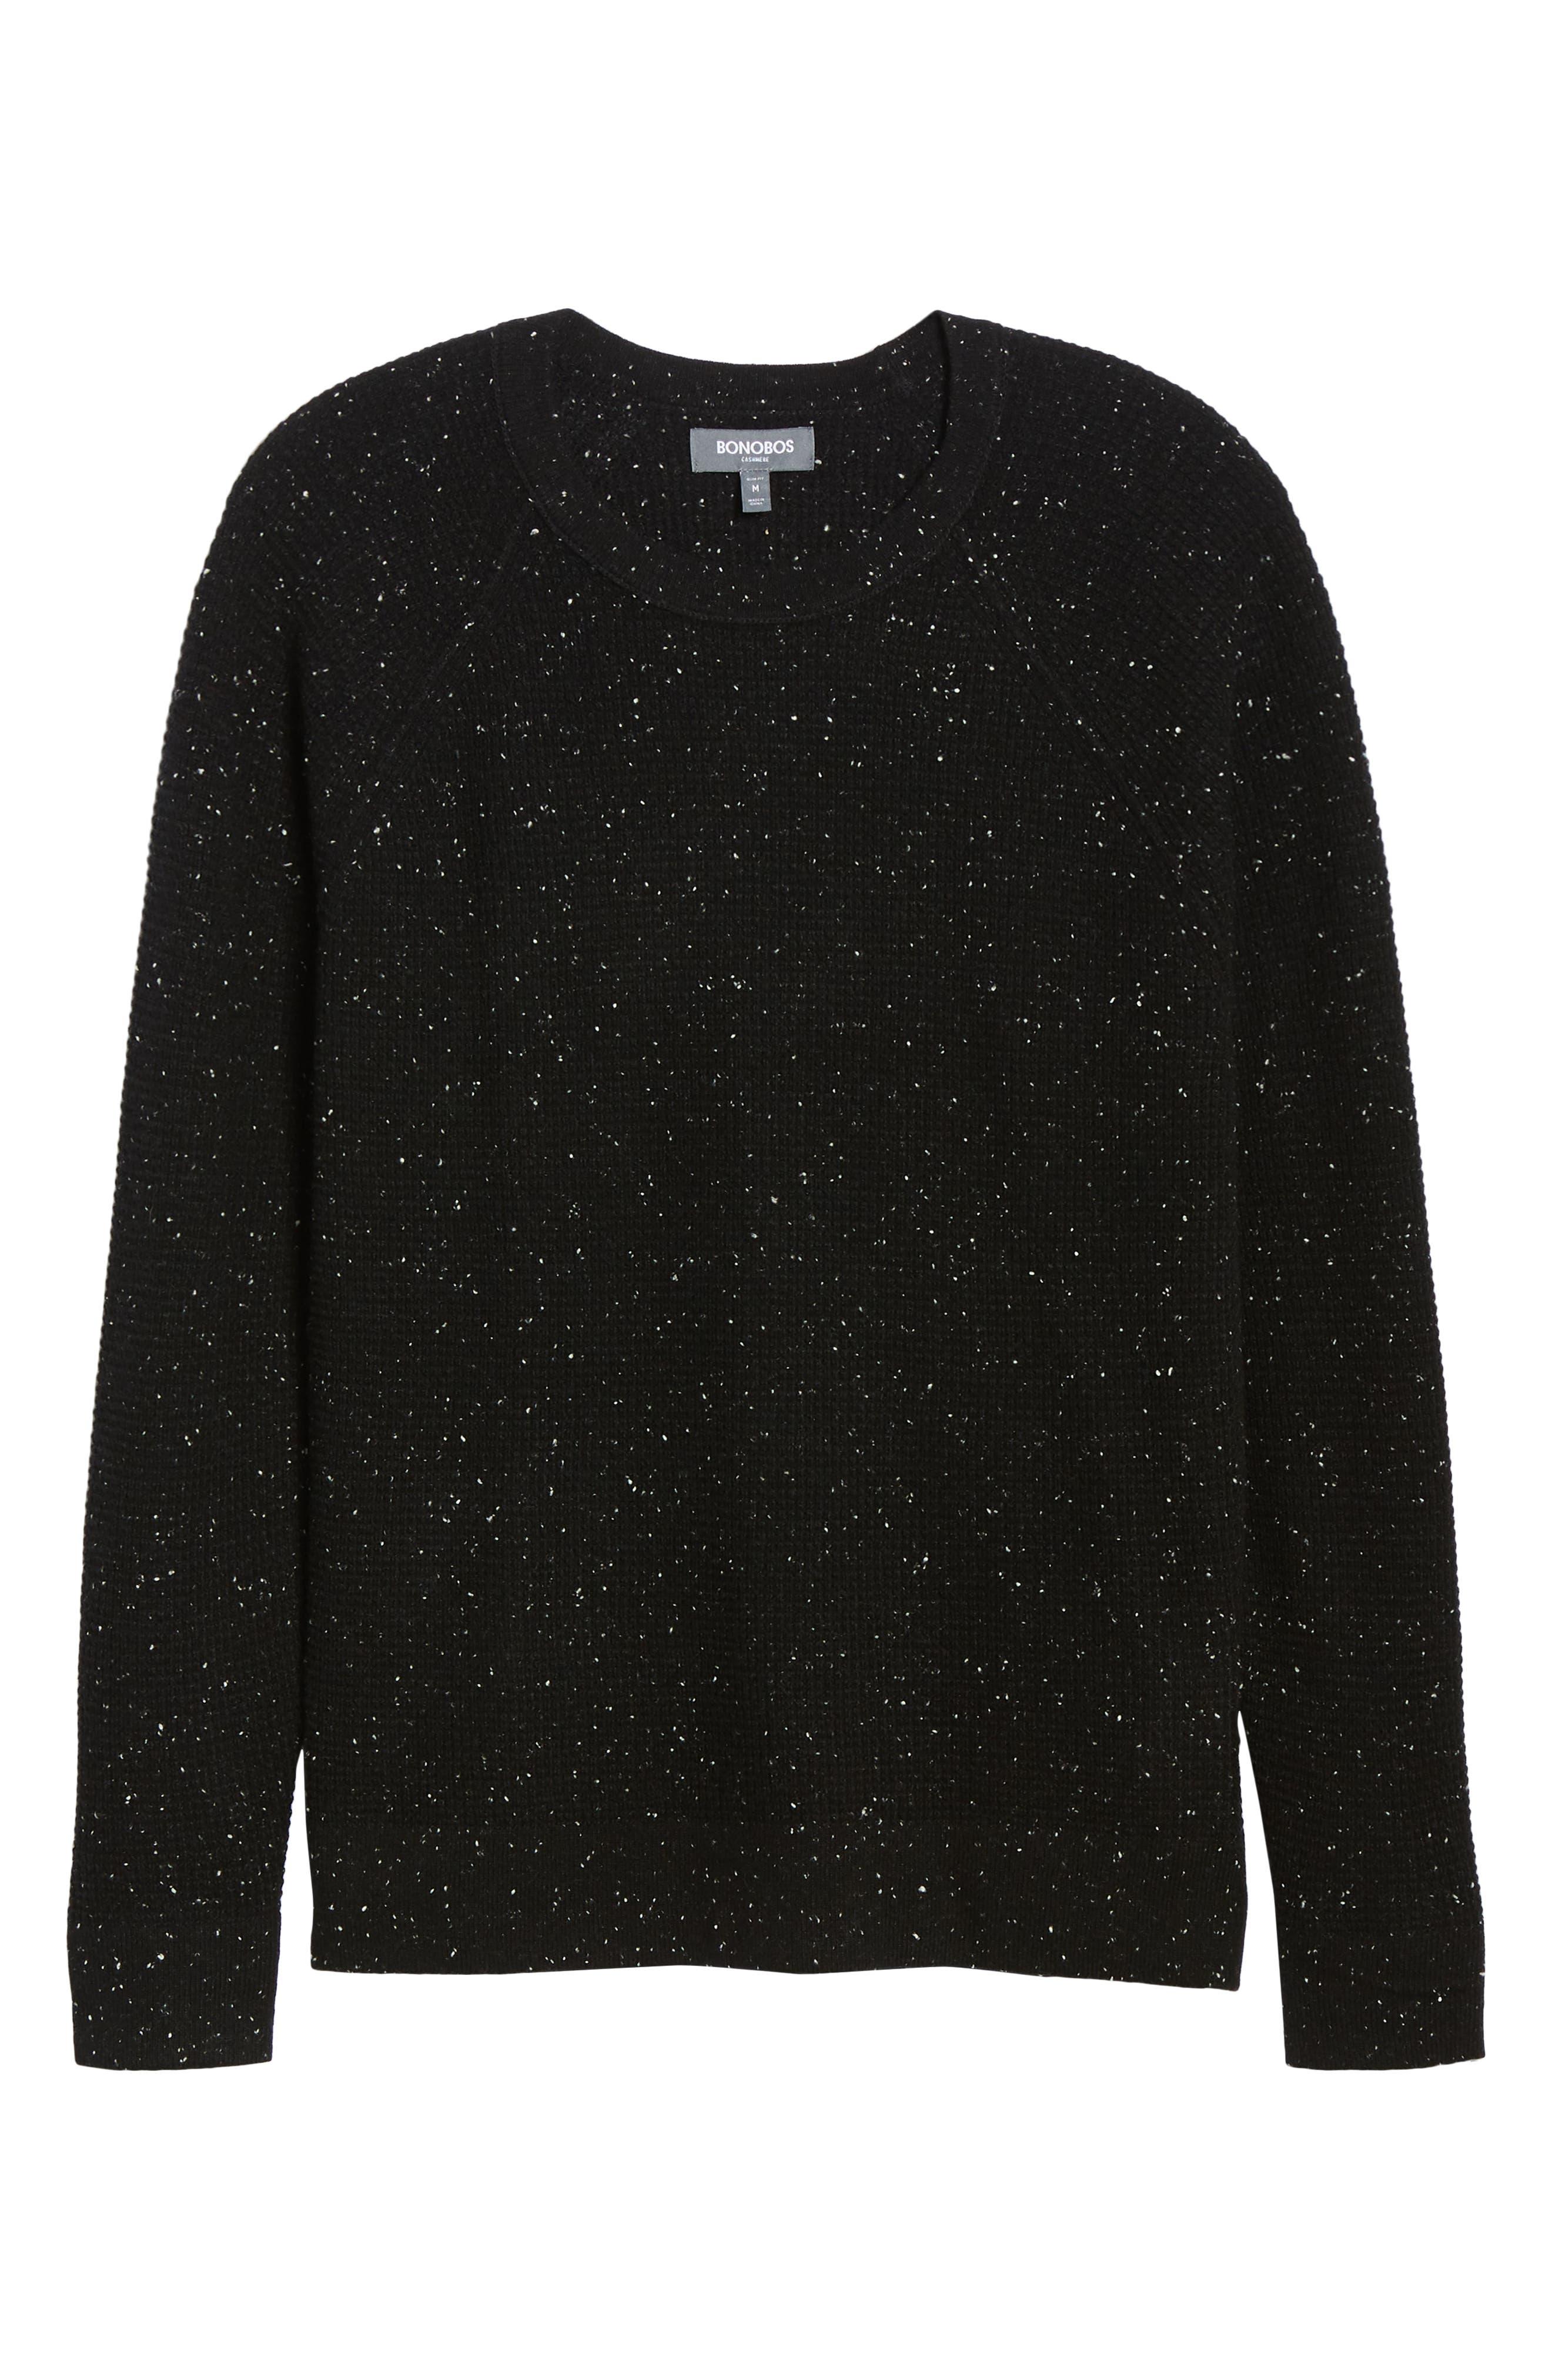 BONOBOS,                             Slim Fit Cashmere Sweater,                             Alternate thumbnail 6, color,                             001